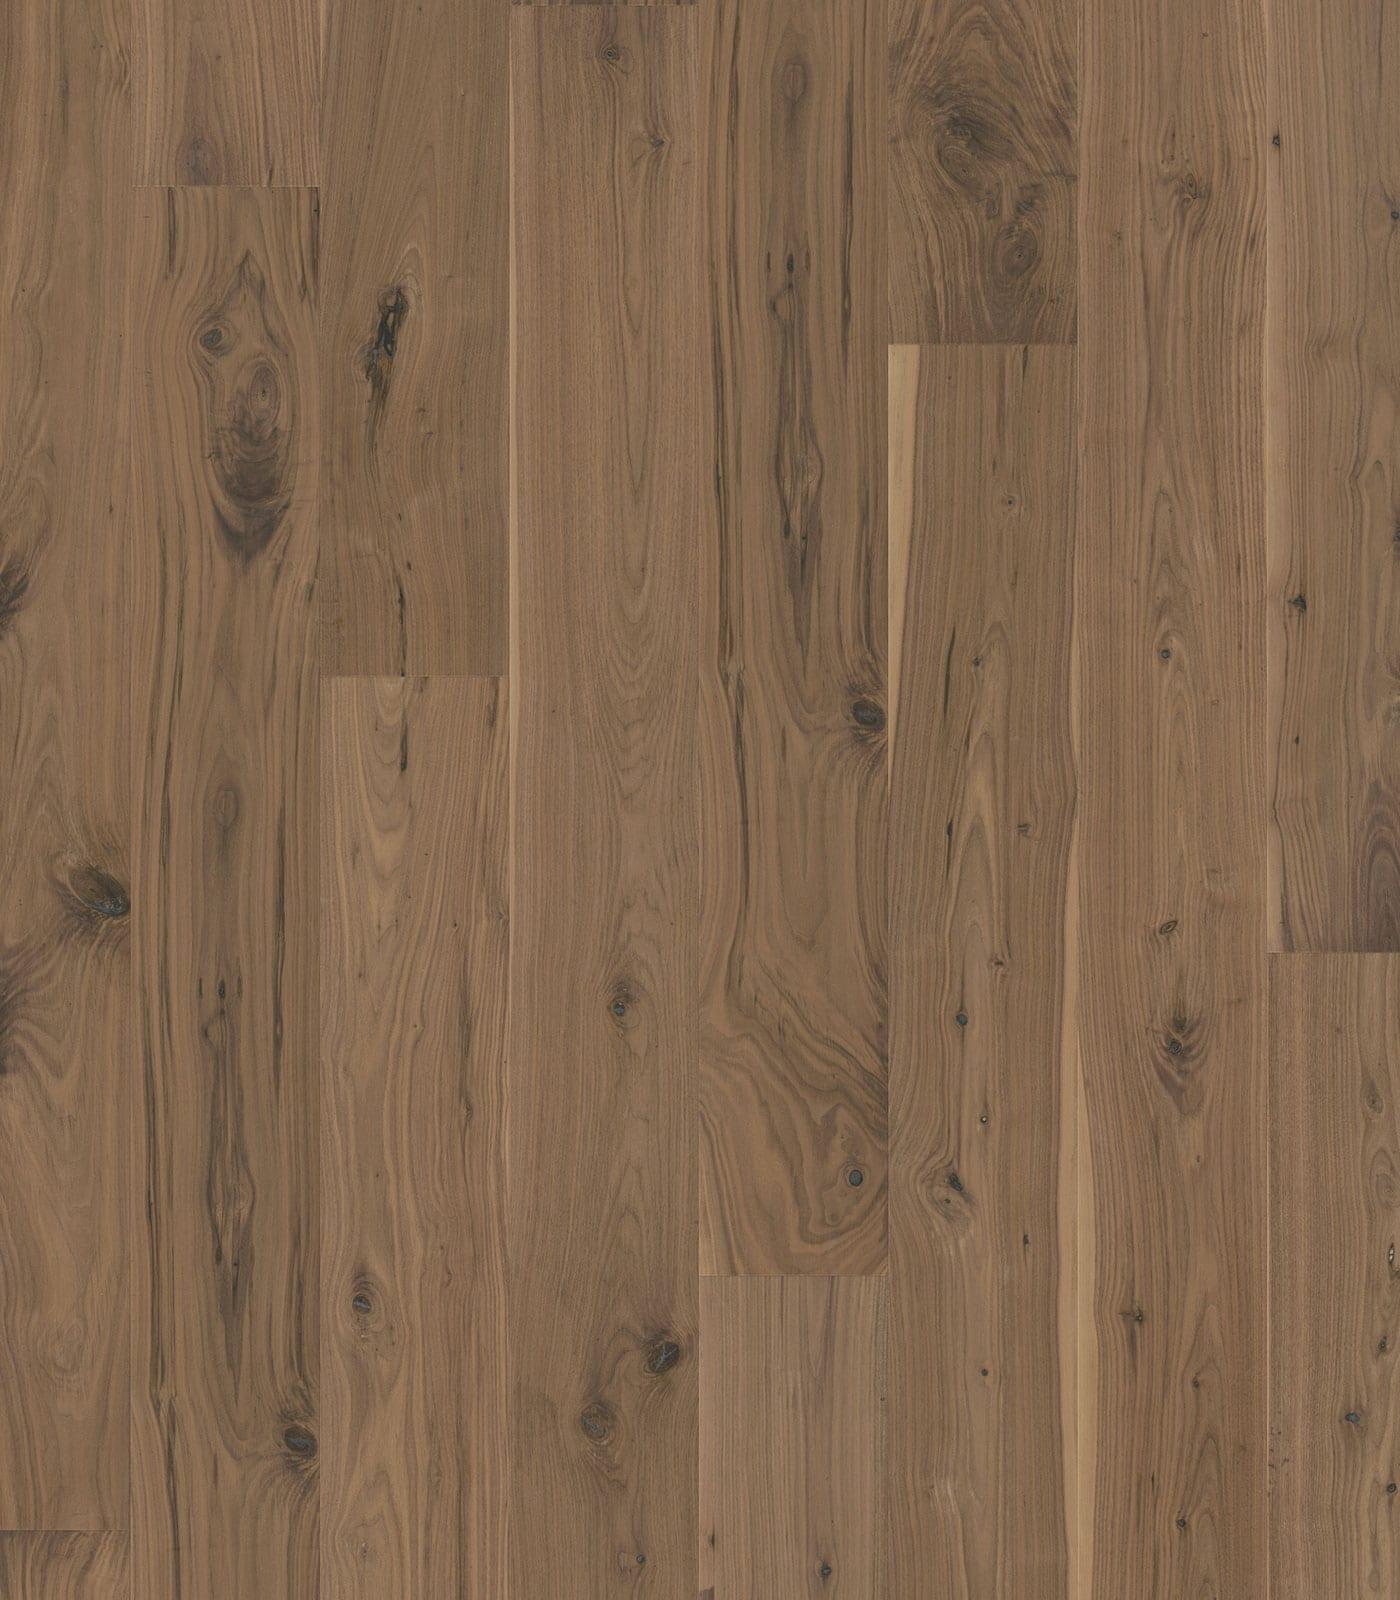 Walnut Polos-Origins Collection-European Walnut floors-flat